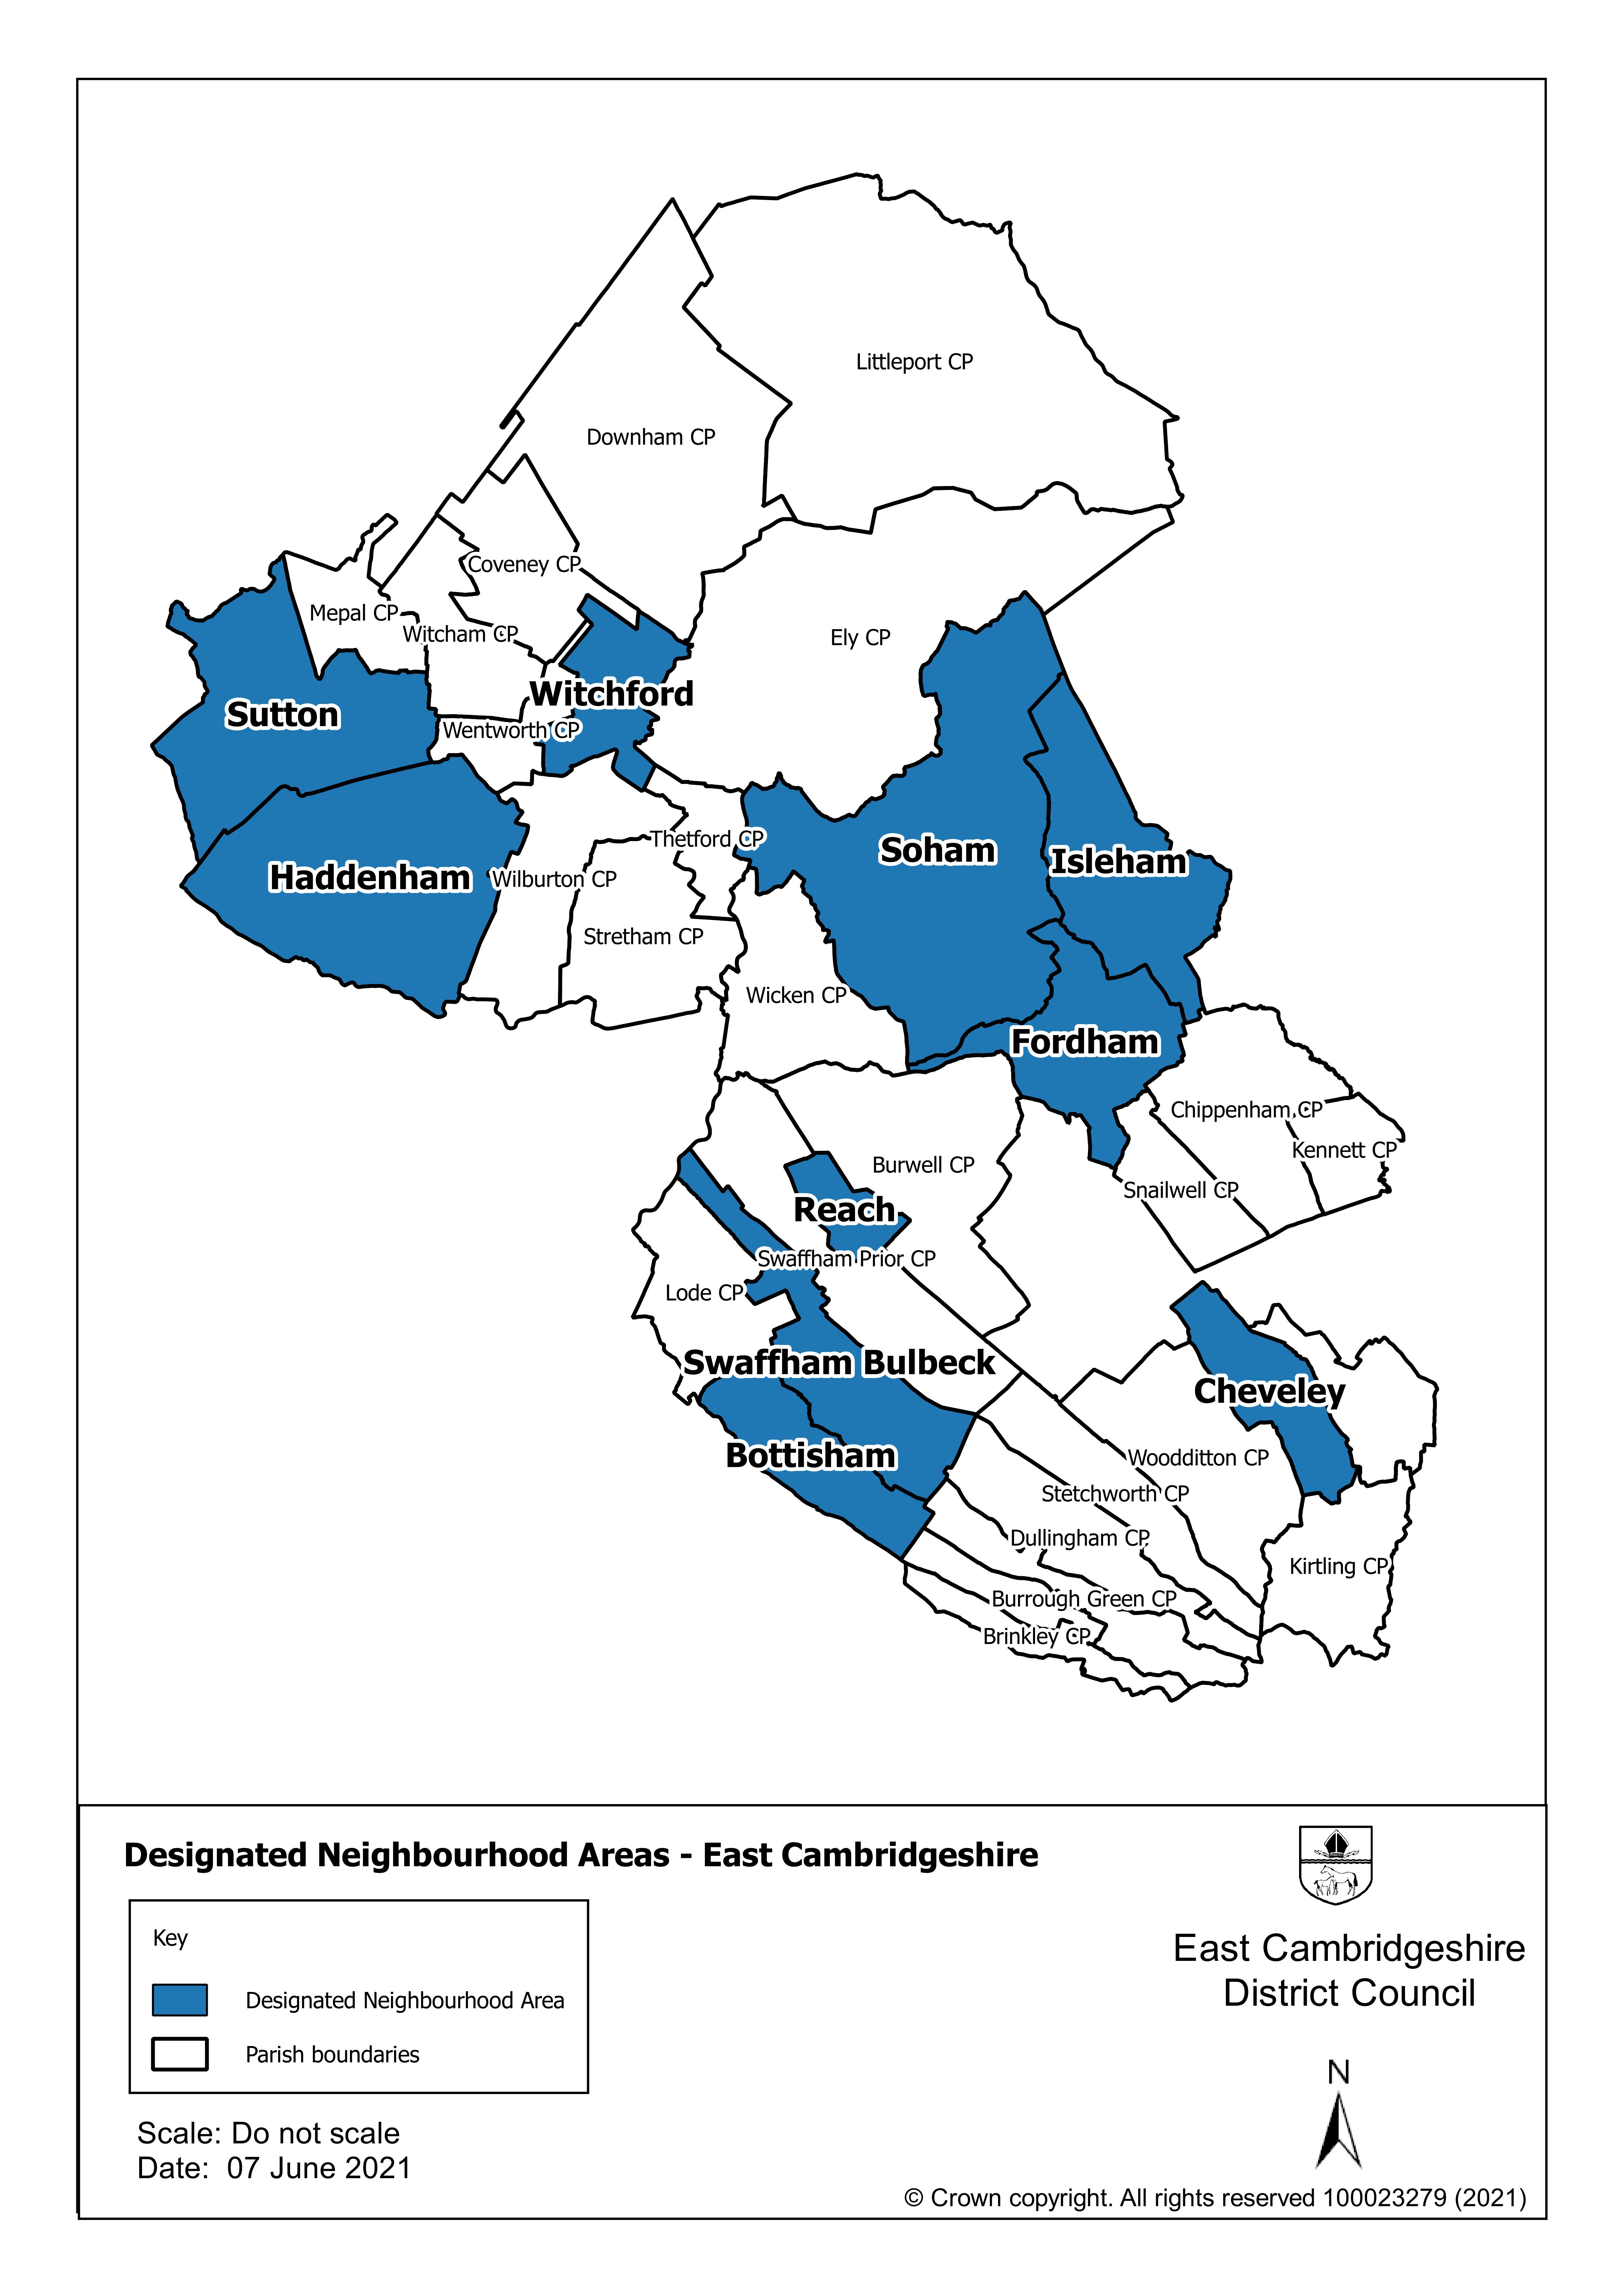 Designated Neighbourhood Areas in East Cambridgeshire